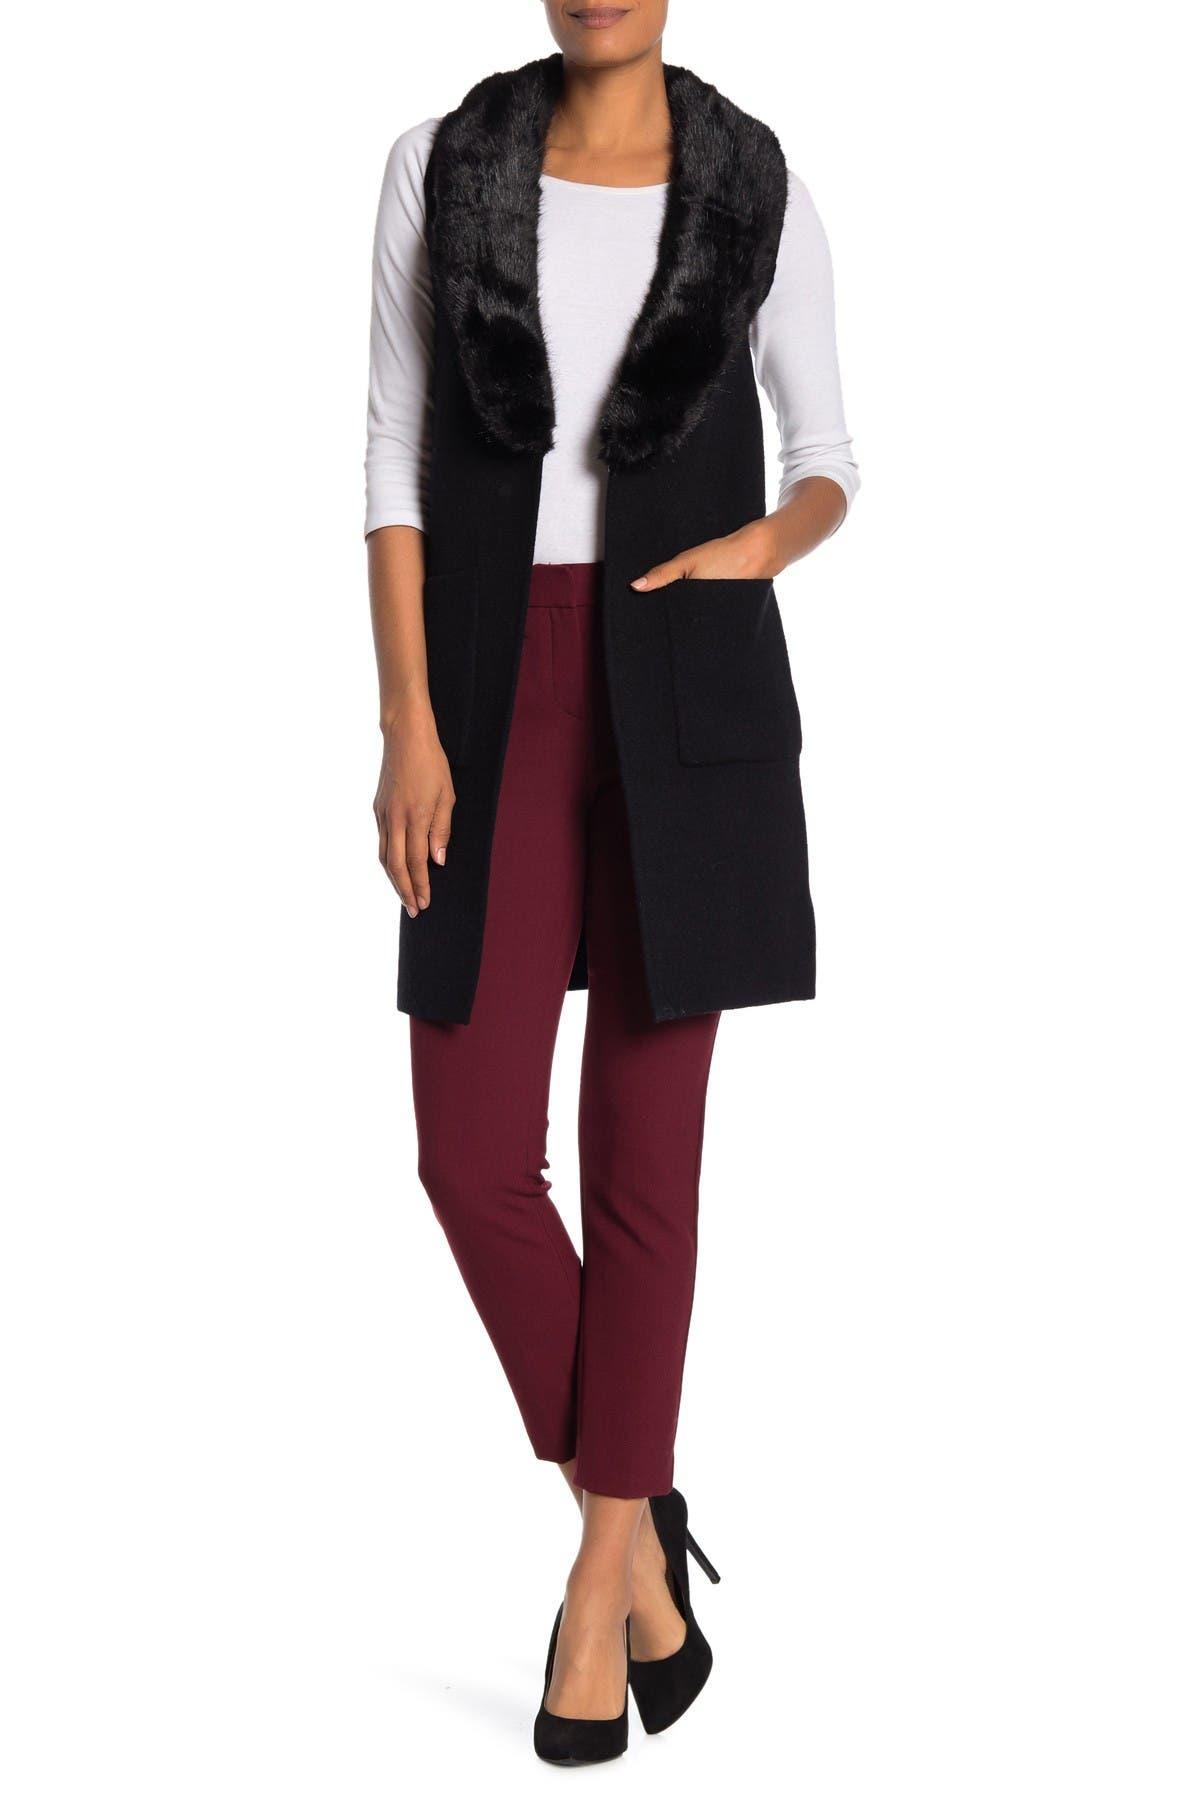 Image of Love Token Faux Fur Collar Sweater Vest